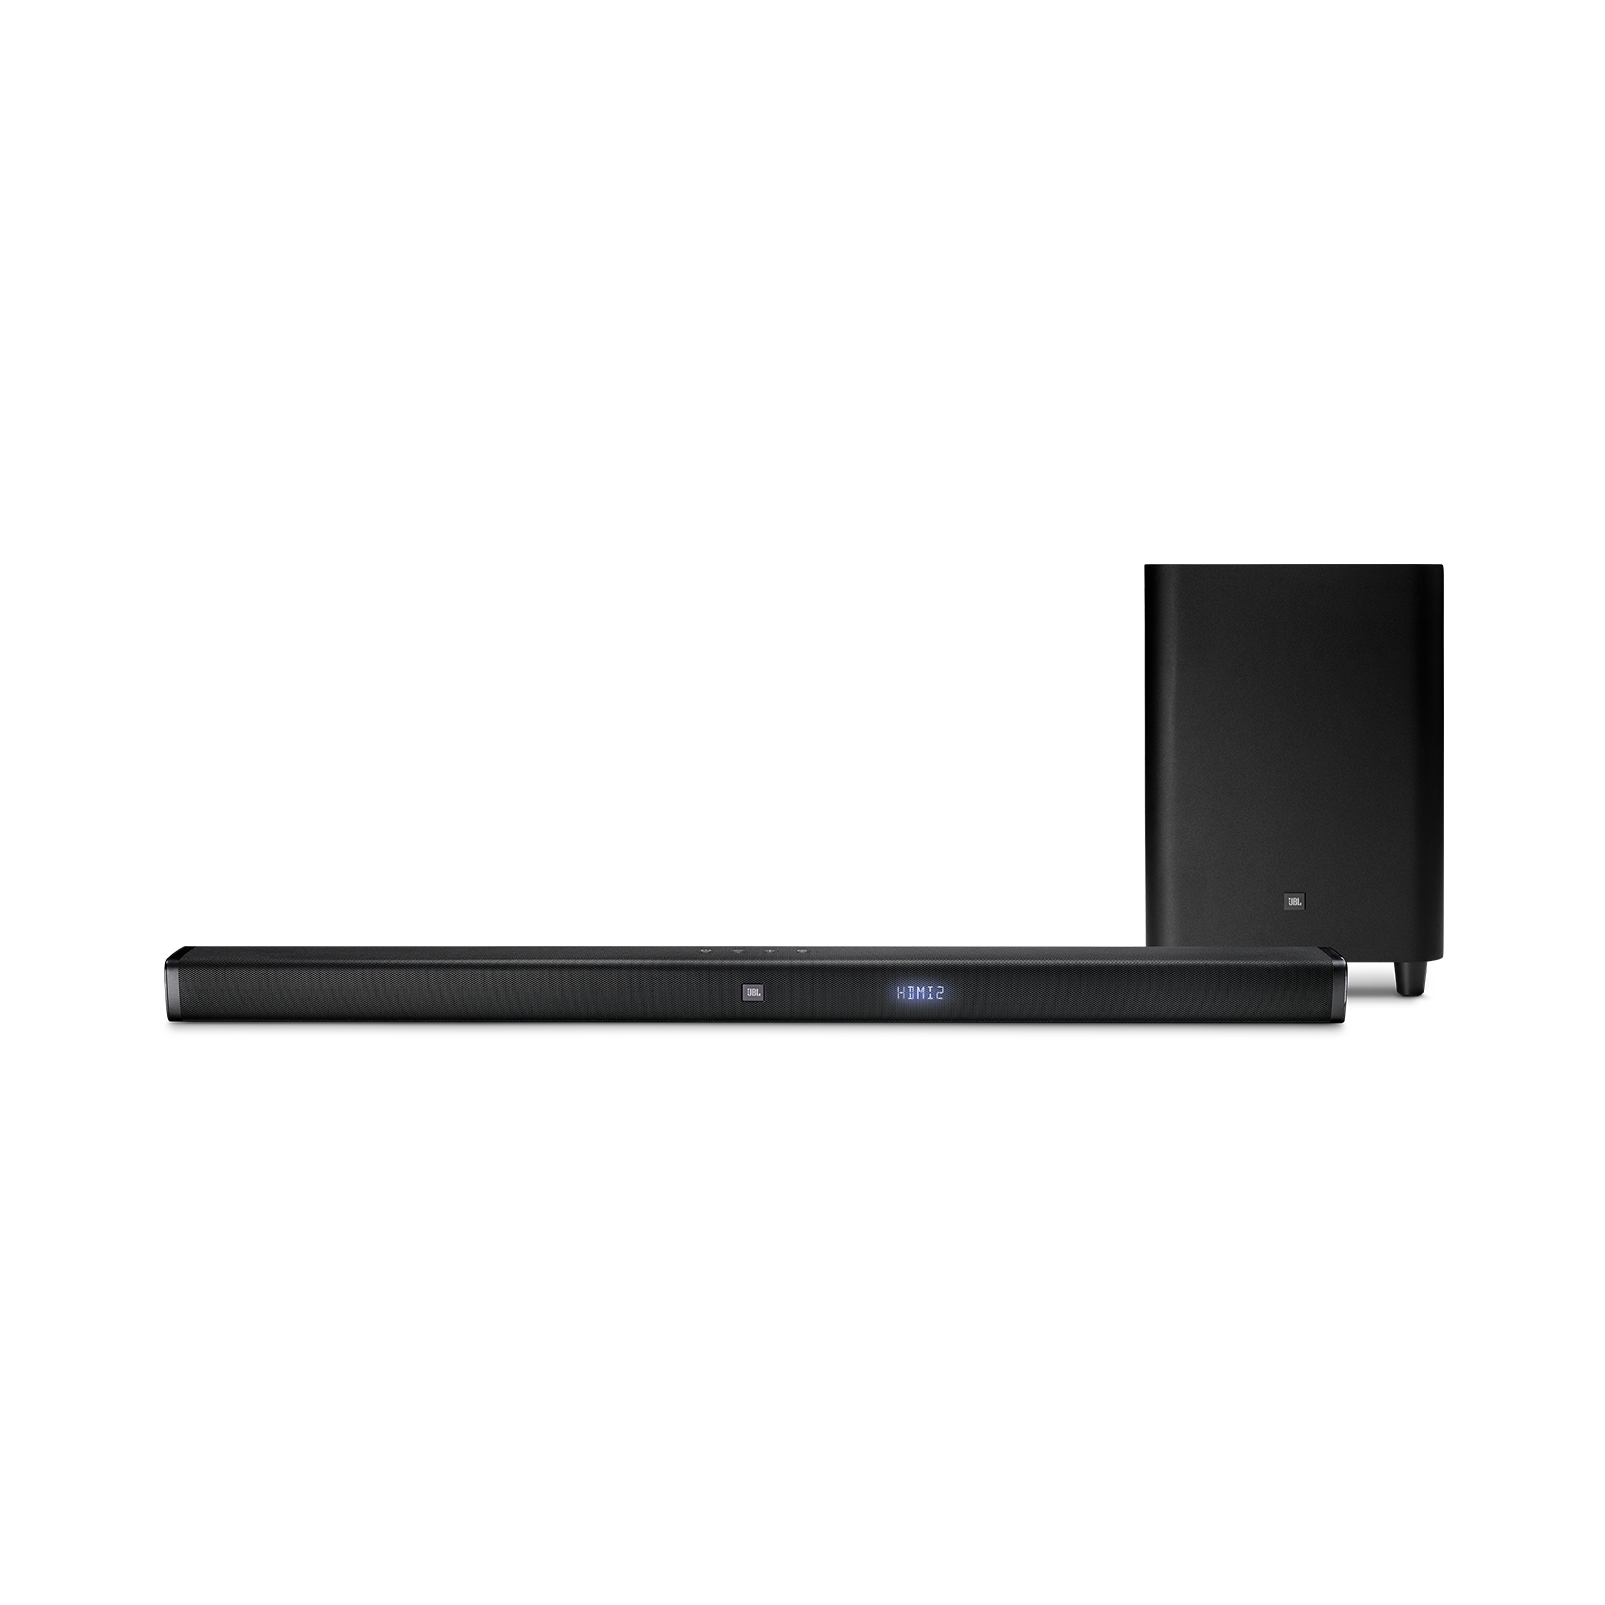 jbl bar 3 1 barre de son 3 1 canaux ultra hd 4k avec caisson de basses sans fil. Black Bedroom Furniture Sets. Home Design Ideas